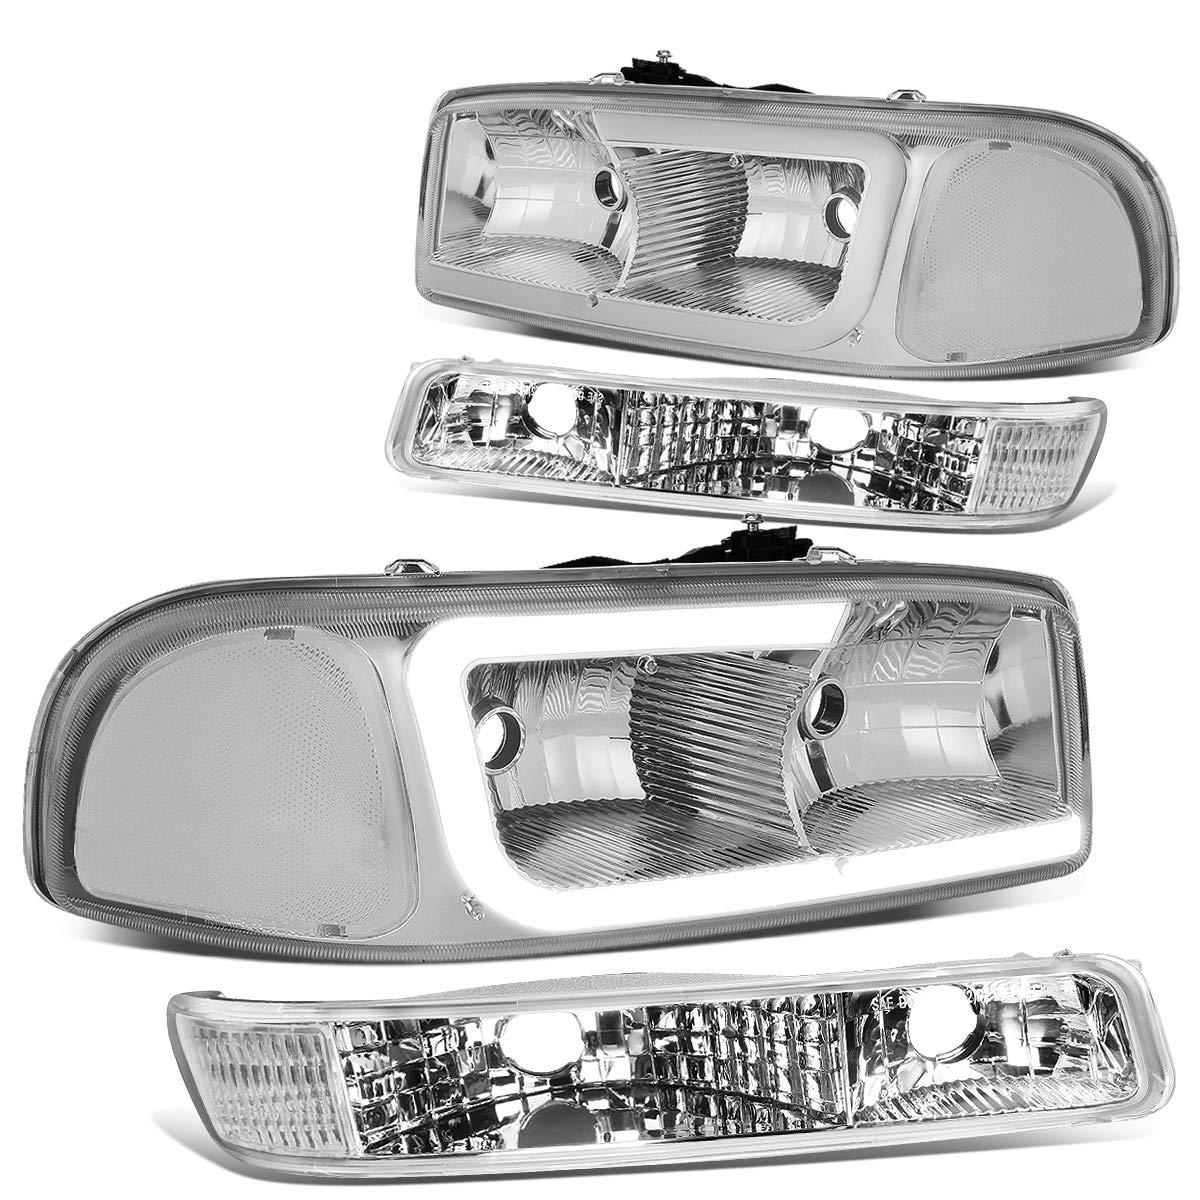 Car & Truck Headlights FOR 99-07 GMC SIERRA/YUKON LED DRL BLACK CLEAR HEADLIGHTS W/BUMPER SIGNAL LAMPS